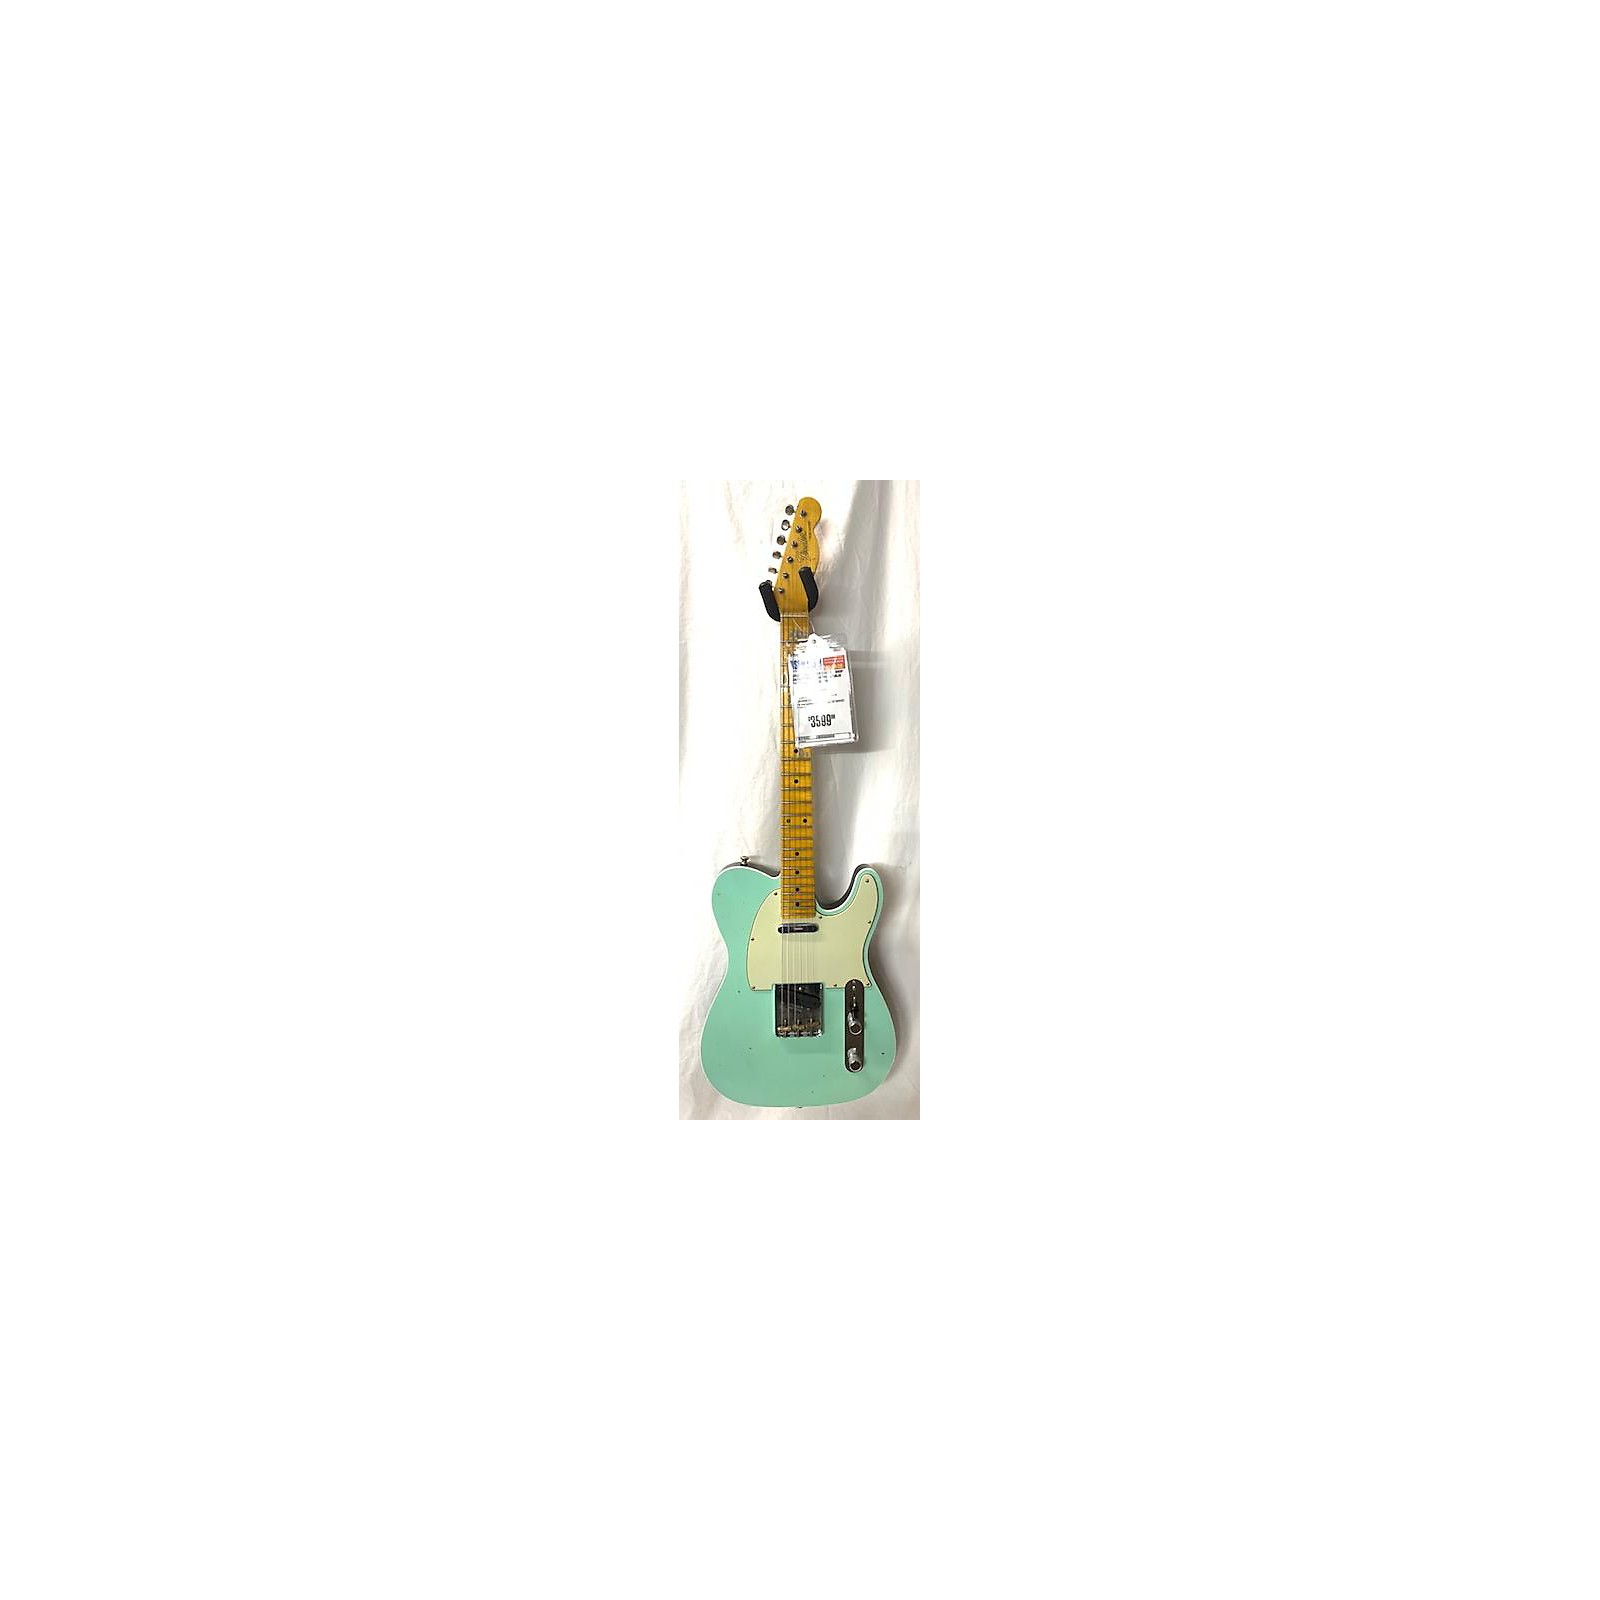 In Store Used Used 2019 Fender Custom Shop XN11927 Seafoam Green Solid Body Electric Guitar